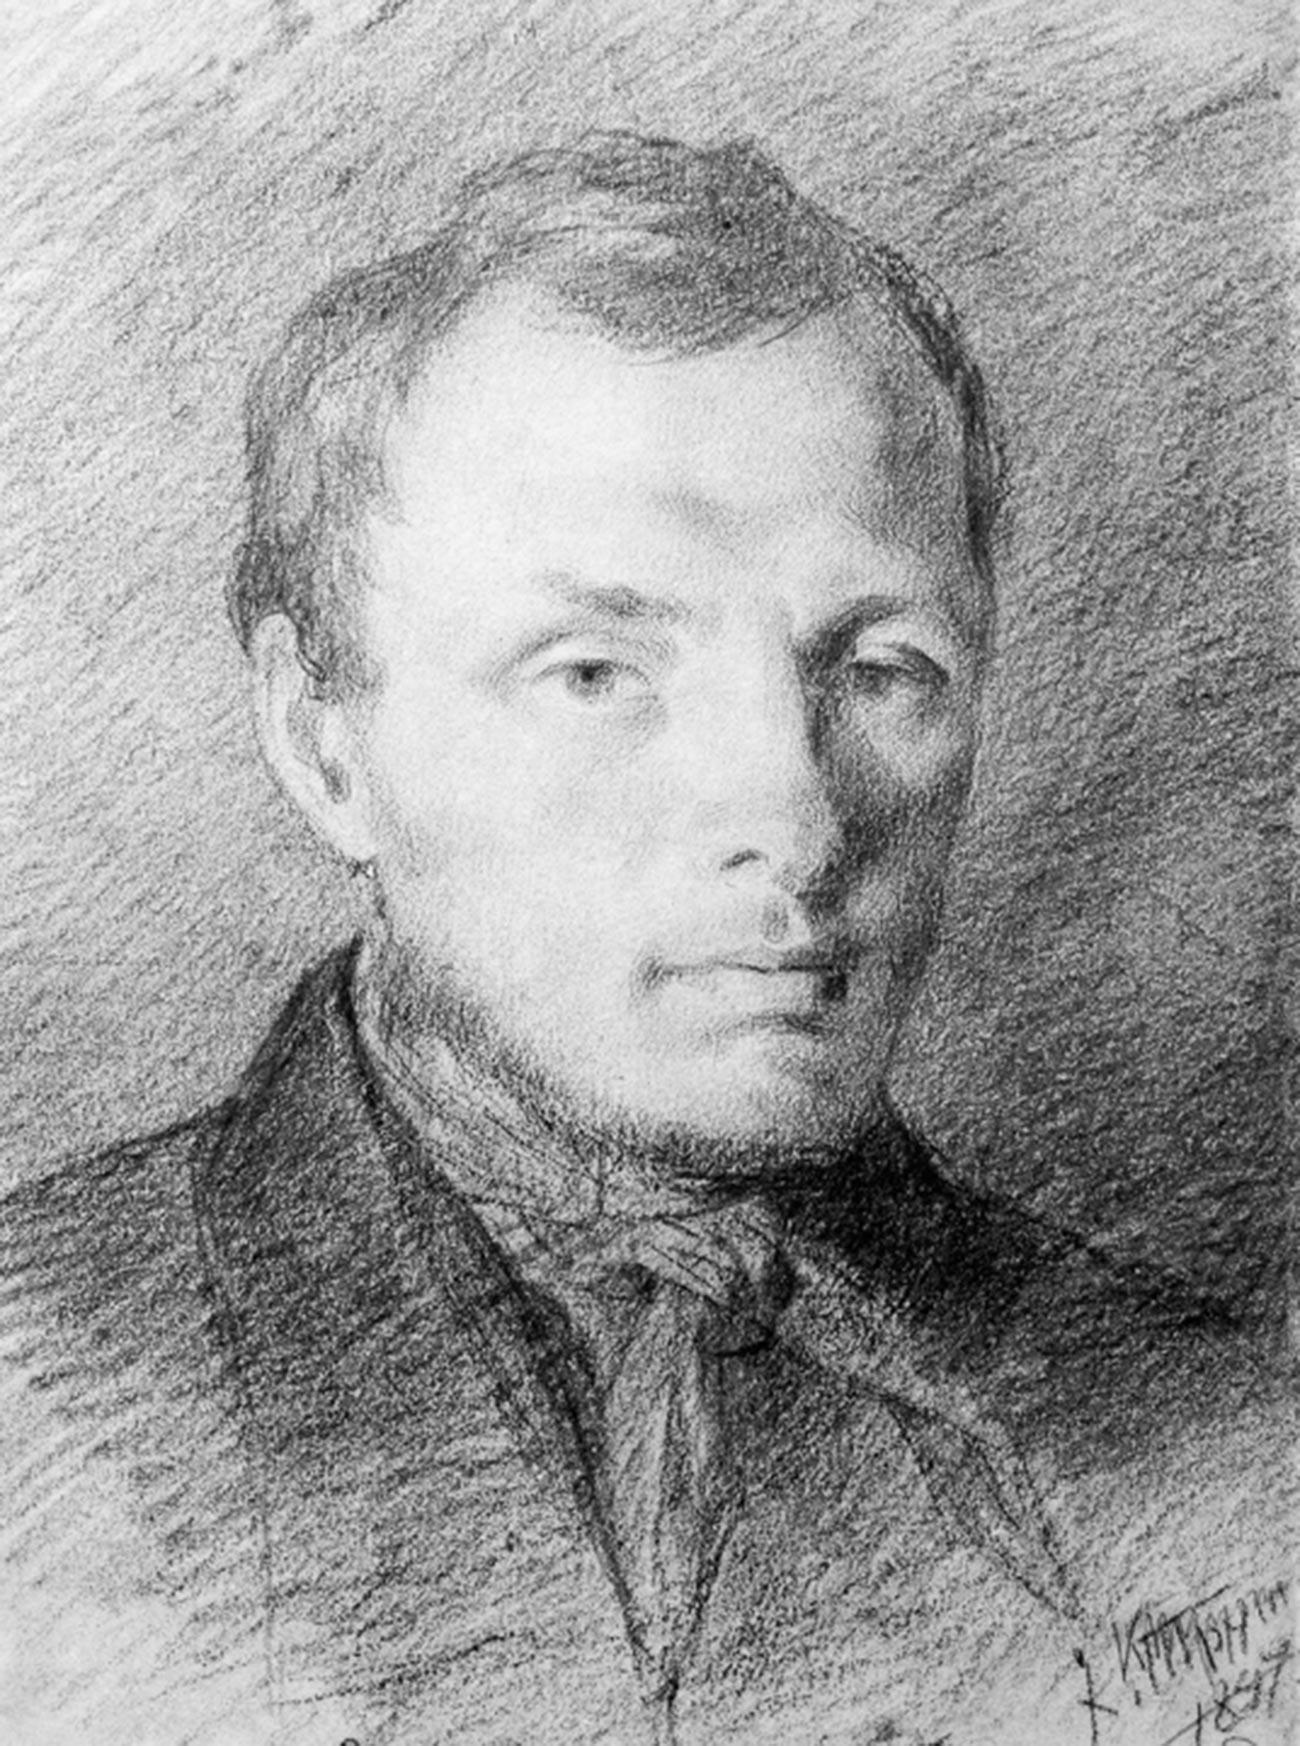 Portrait of Fyodor Mikhailovich Dostoevsky